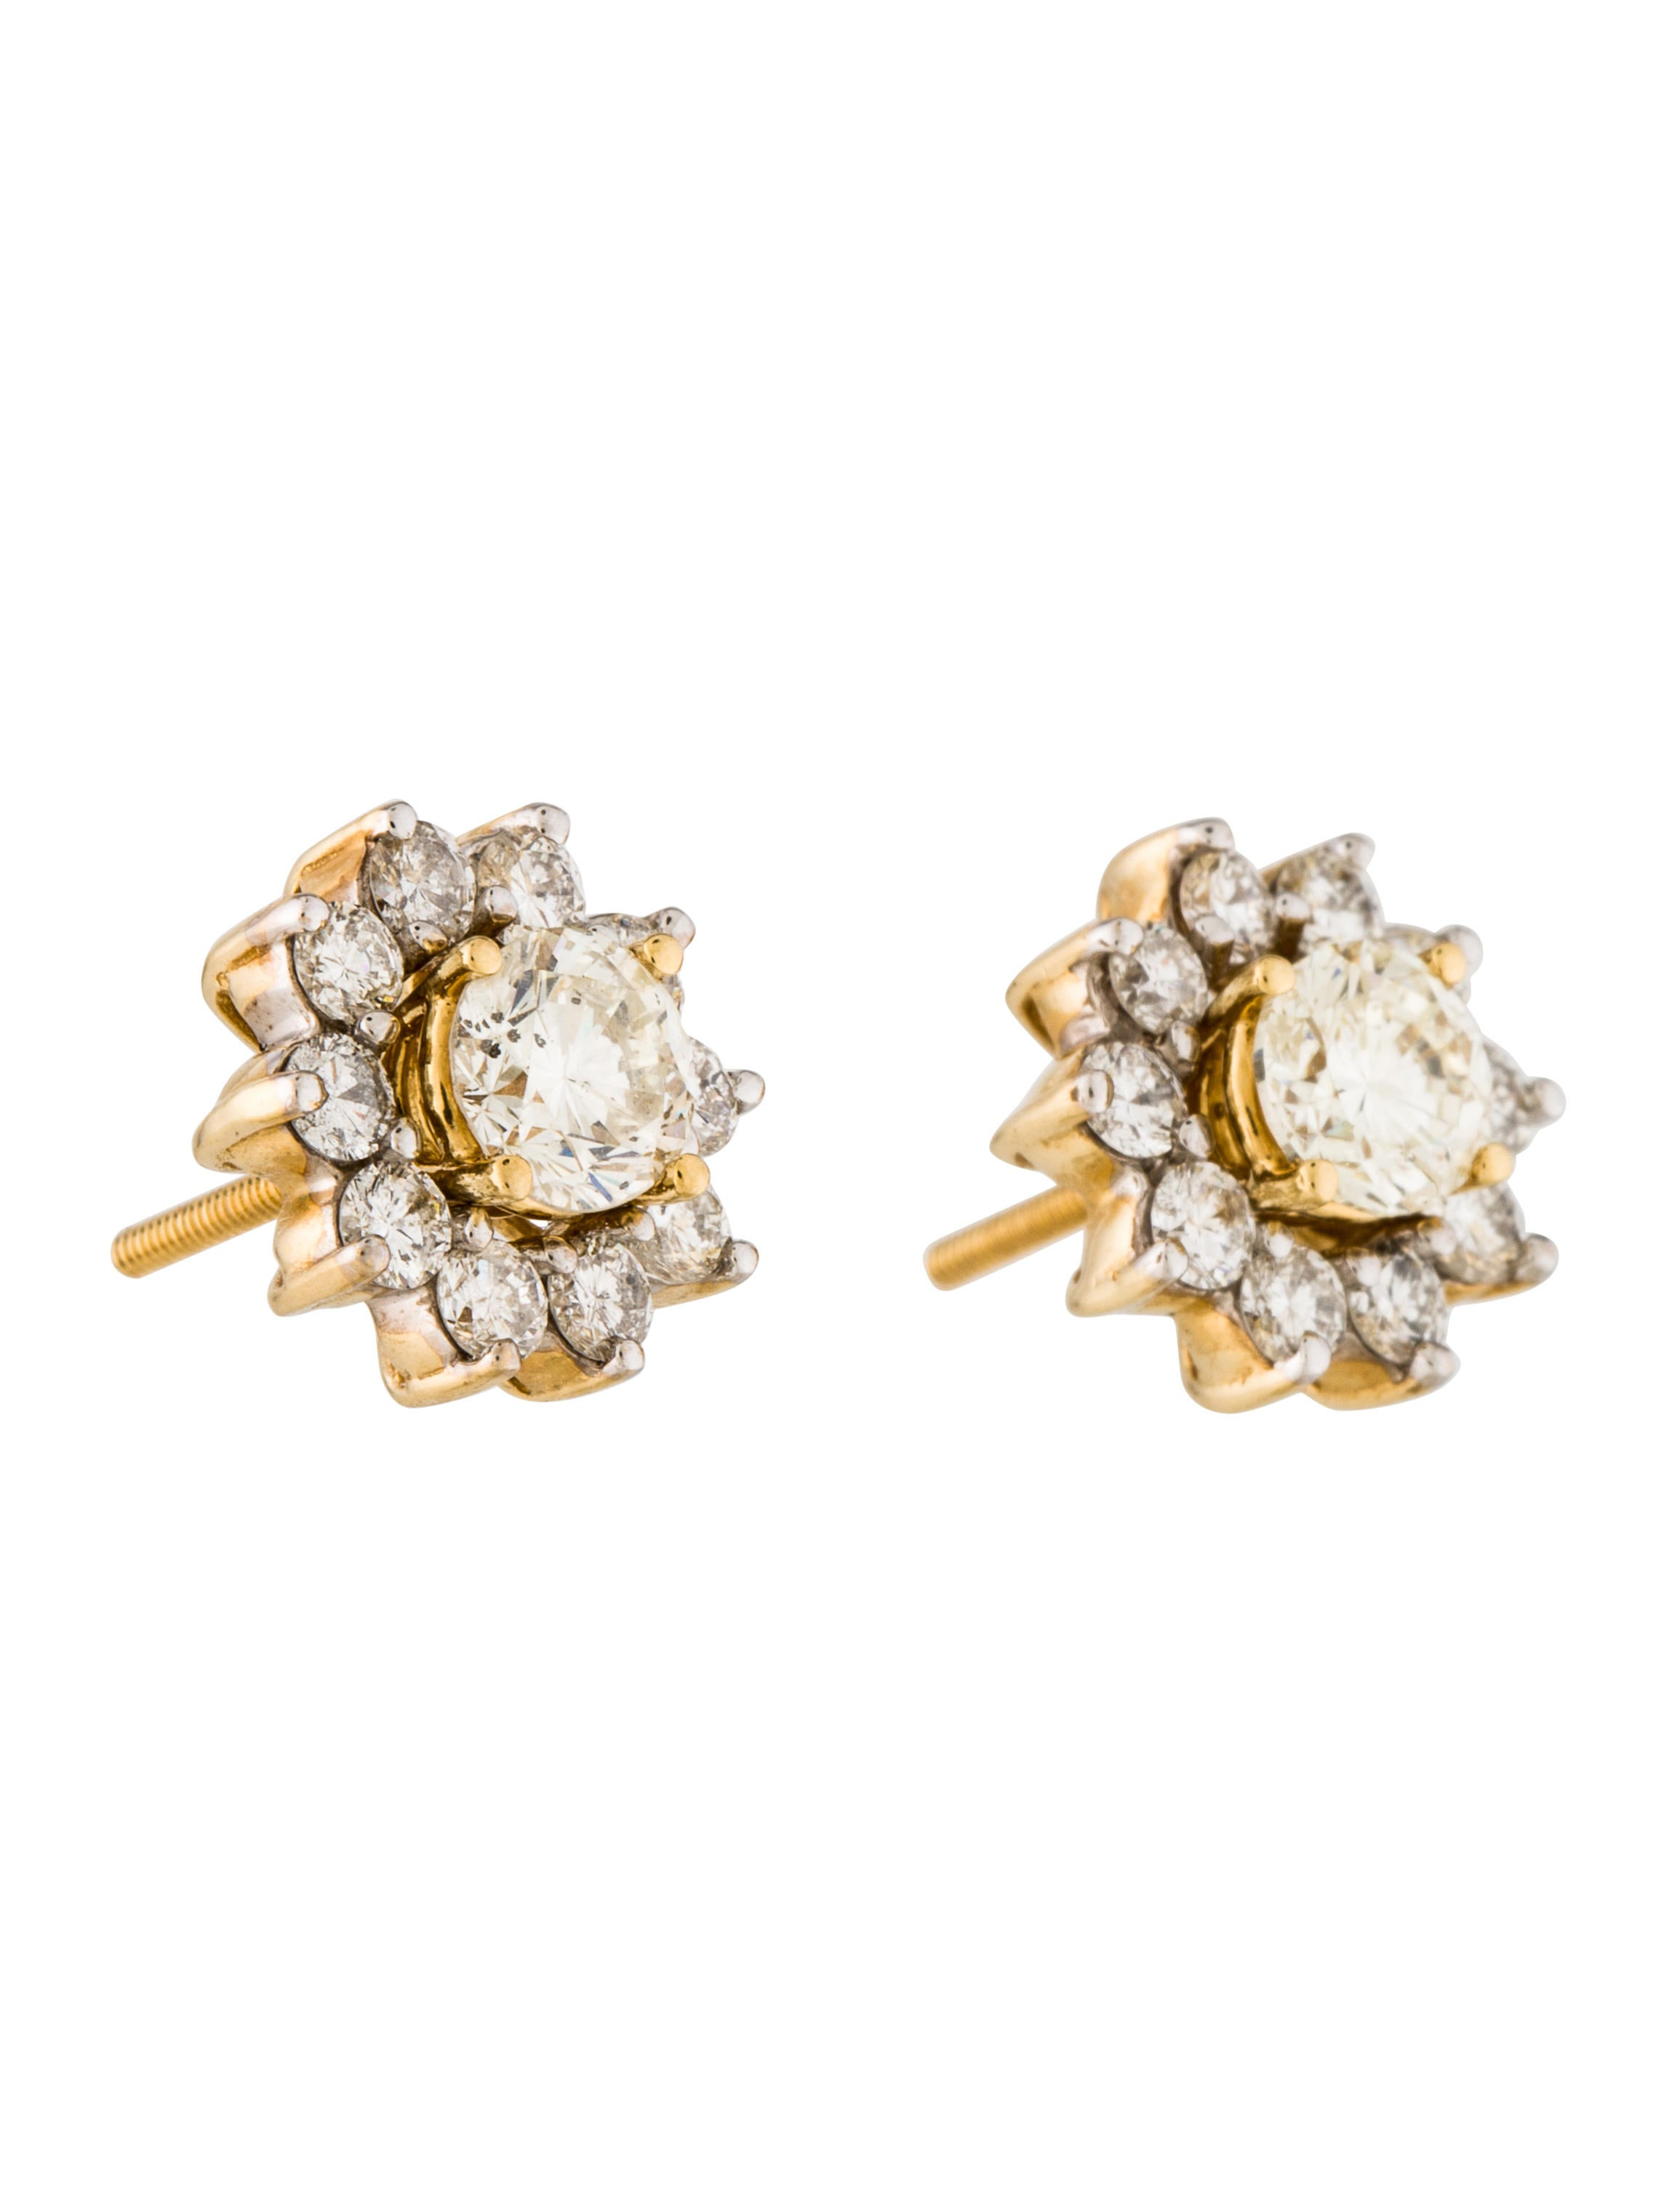 14k diamond stud earring enhancers earrings. Black Bedroom Furniture Sets. Home Design Ideas